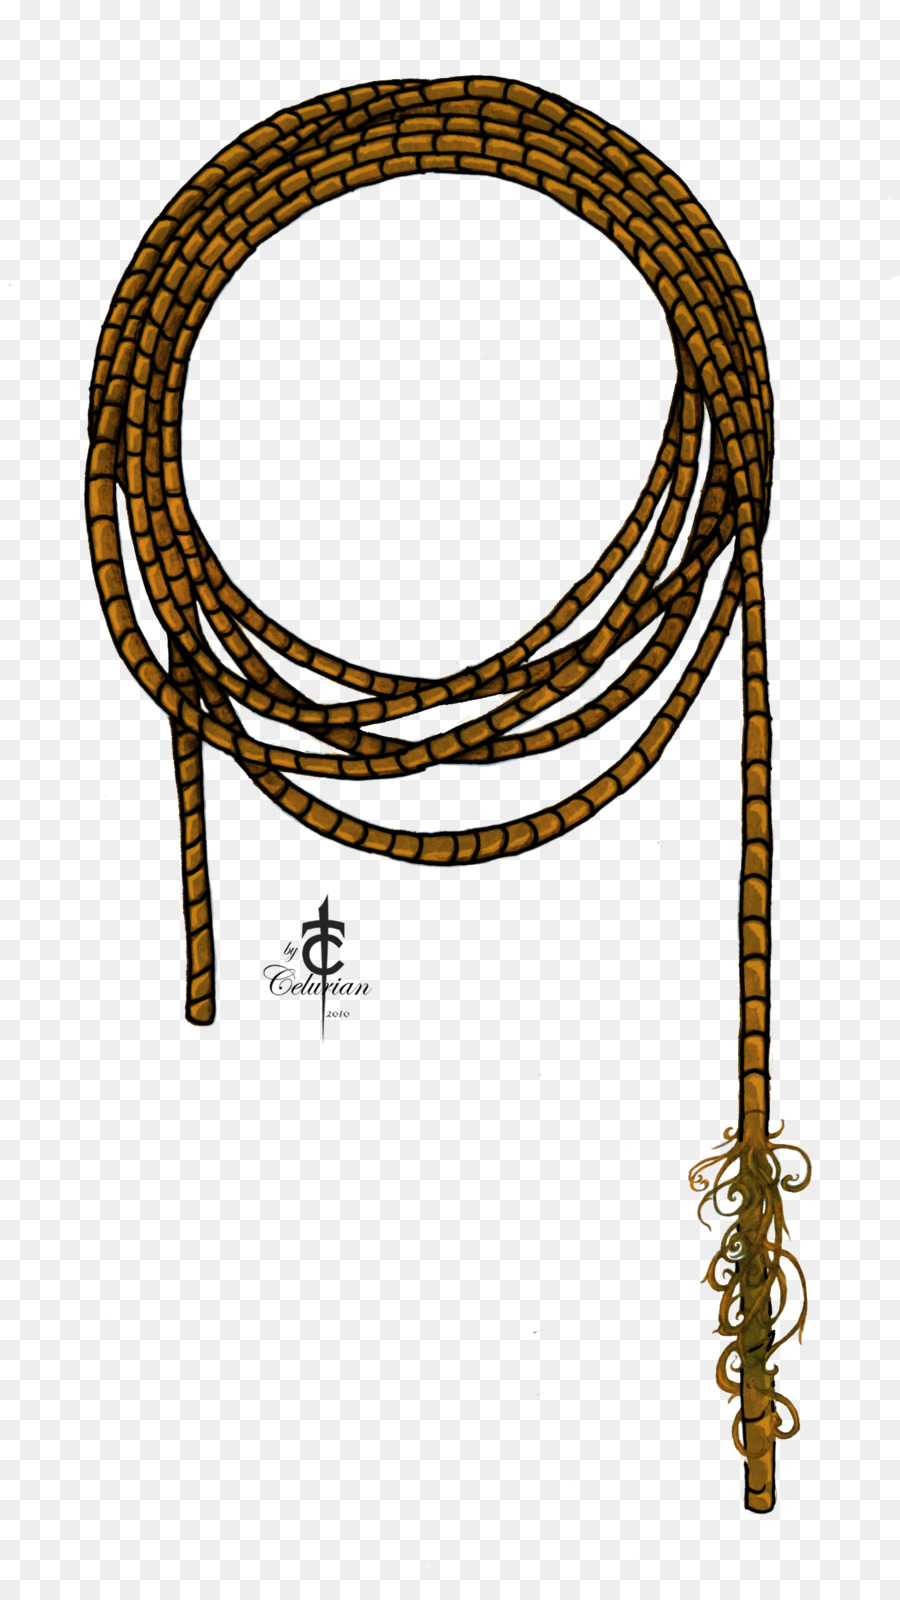 Lasso clipart. Rope cowboy clip art